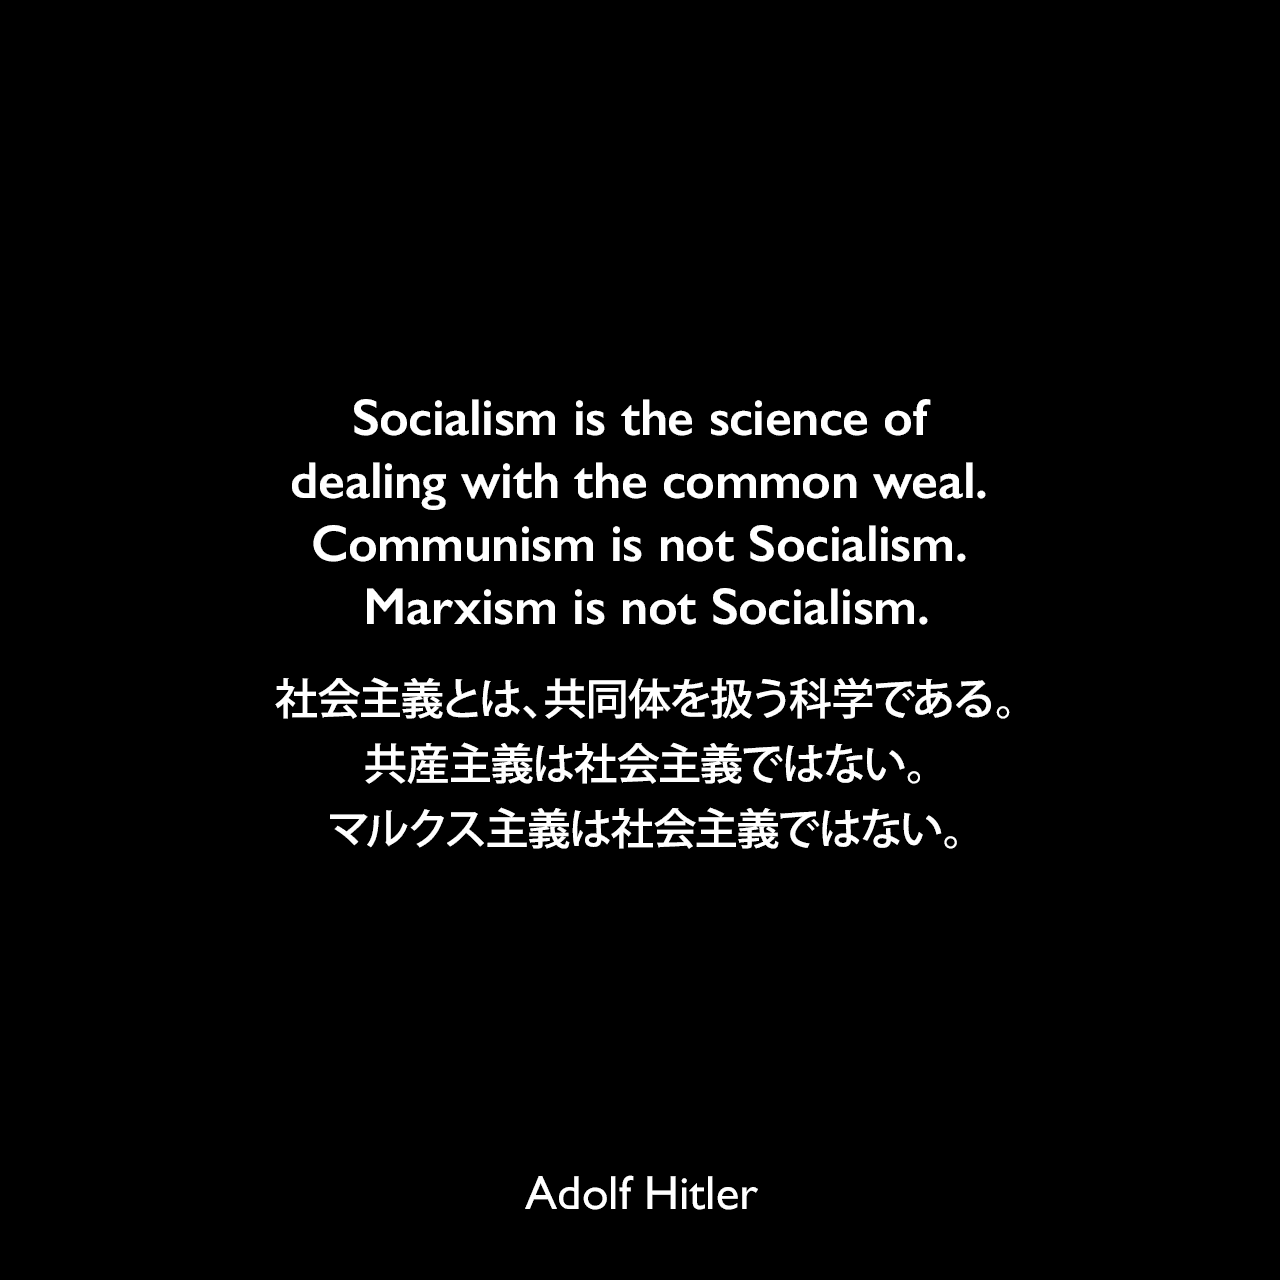 Socialism is the science of dealing with the common weal. Communism is not Socialism. Marxism is not Socialism.社会主義とは、共同体を扱う科学である。共産主義は社会主義ではない。マルクス主義は社会主義ではない。- 1923年 詩人ジョージ・シルヴェスター・ヴィエレックとのインタビューよりAdolf Hitler